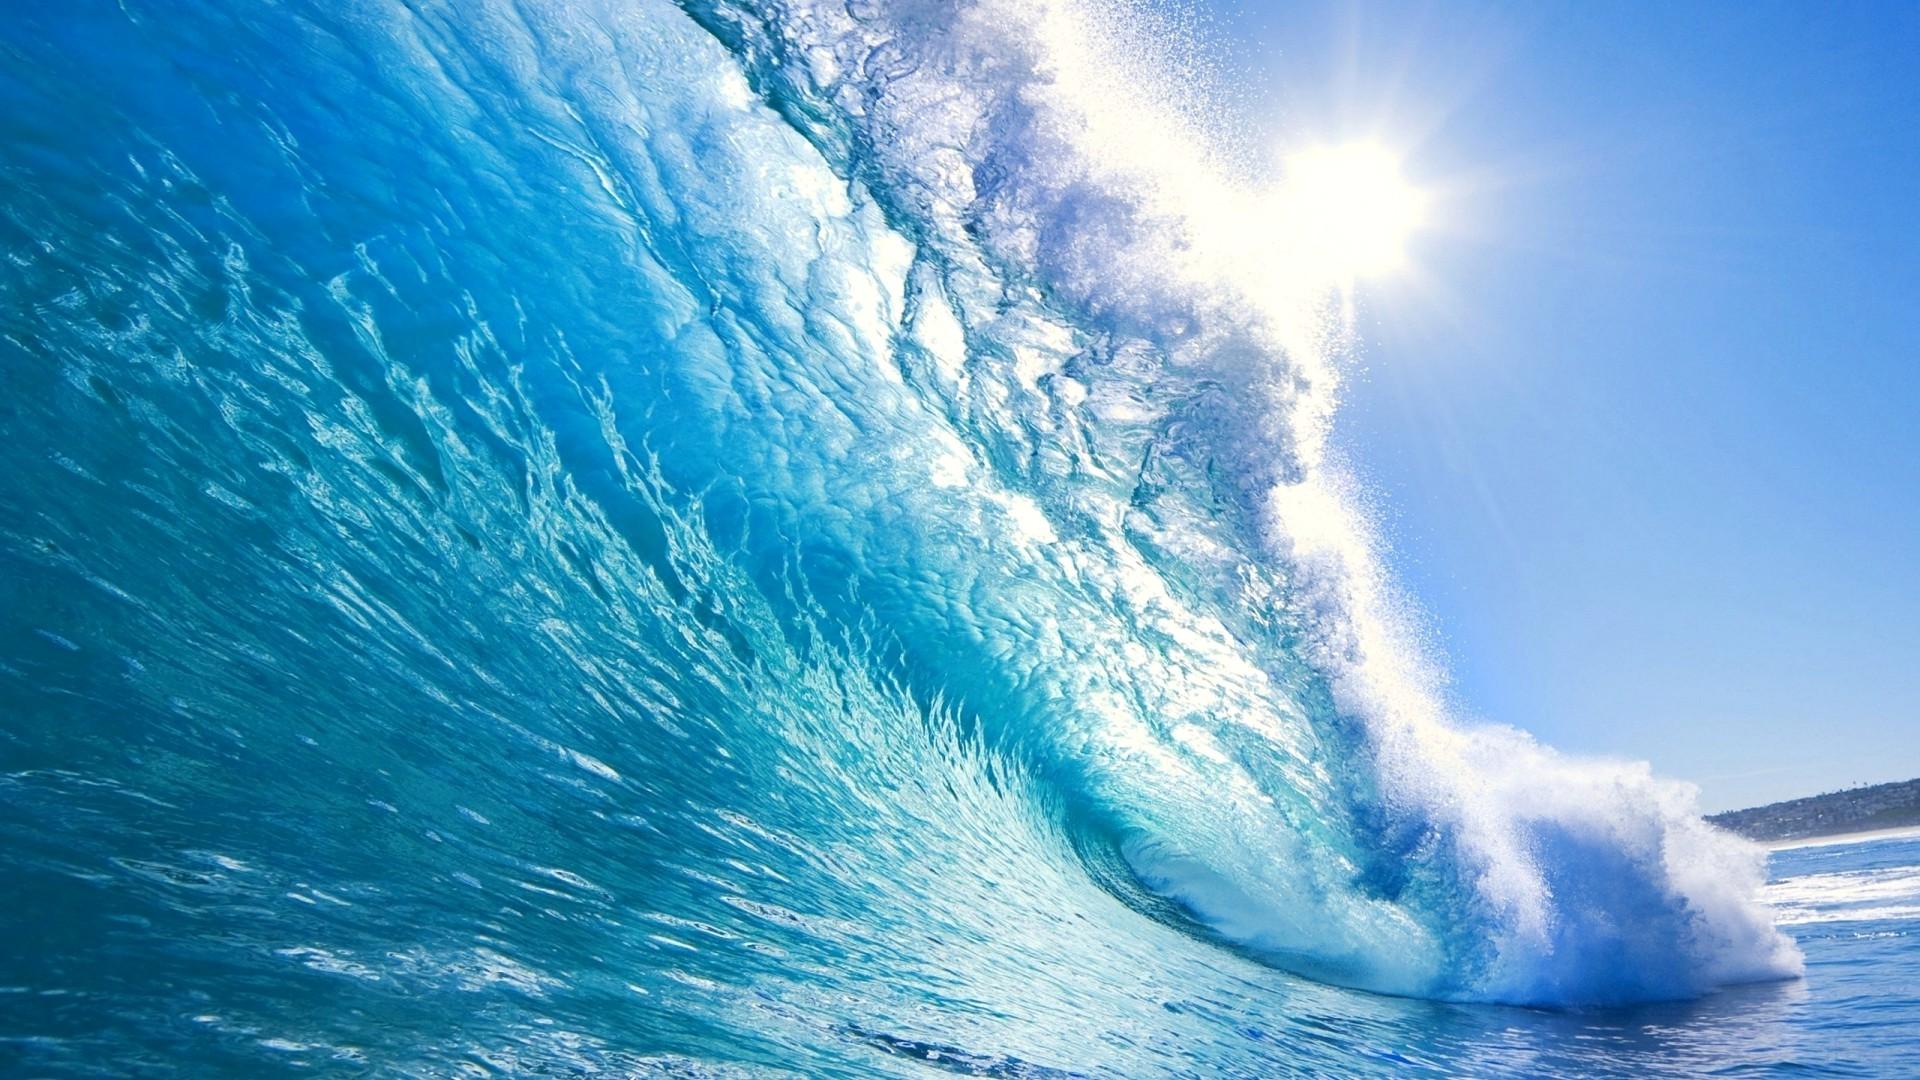 Beautiful Sea Wallpaper HD | Freetopwallpaper.com